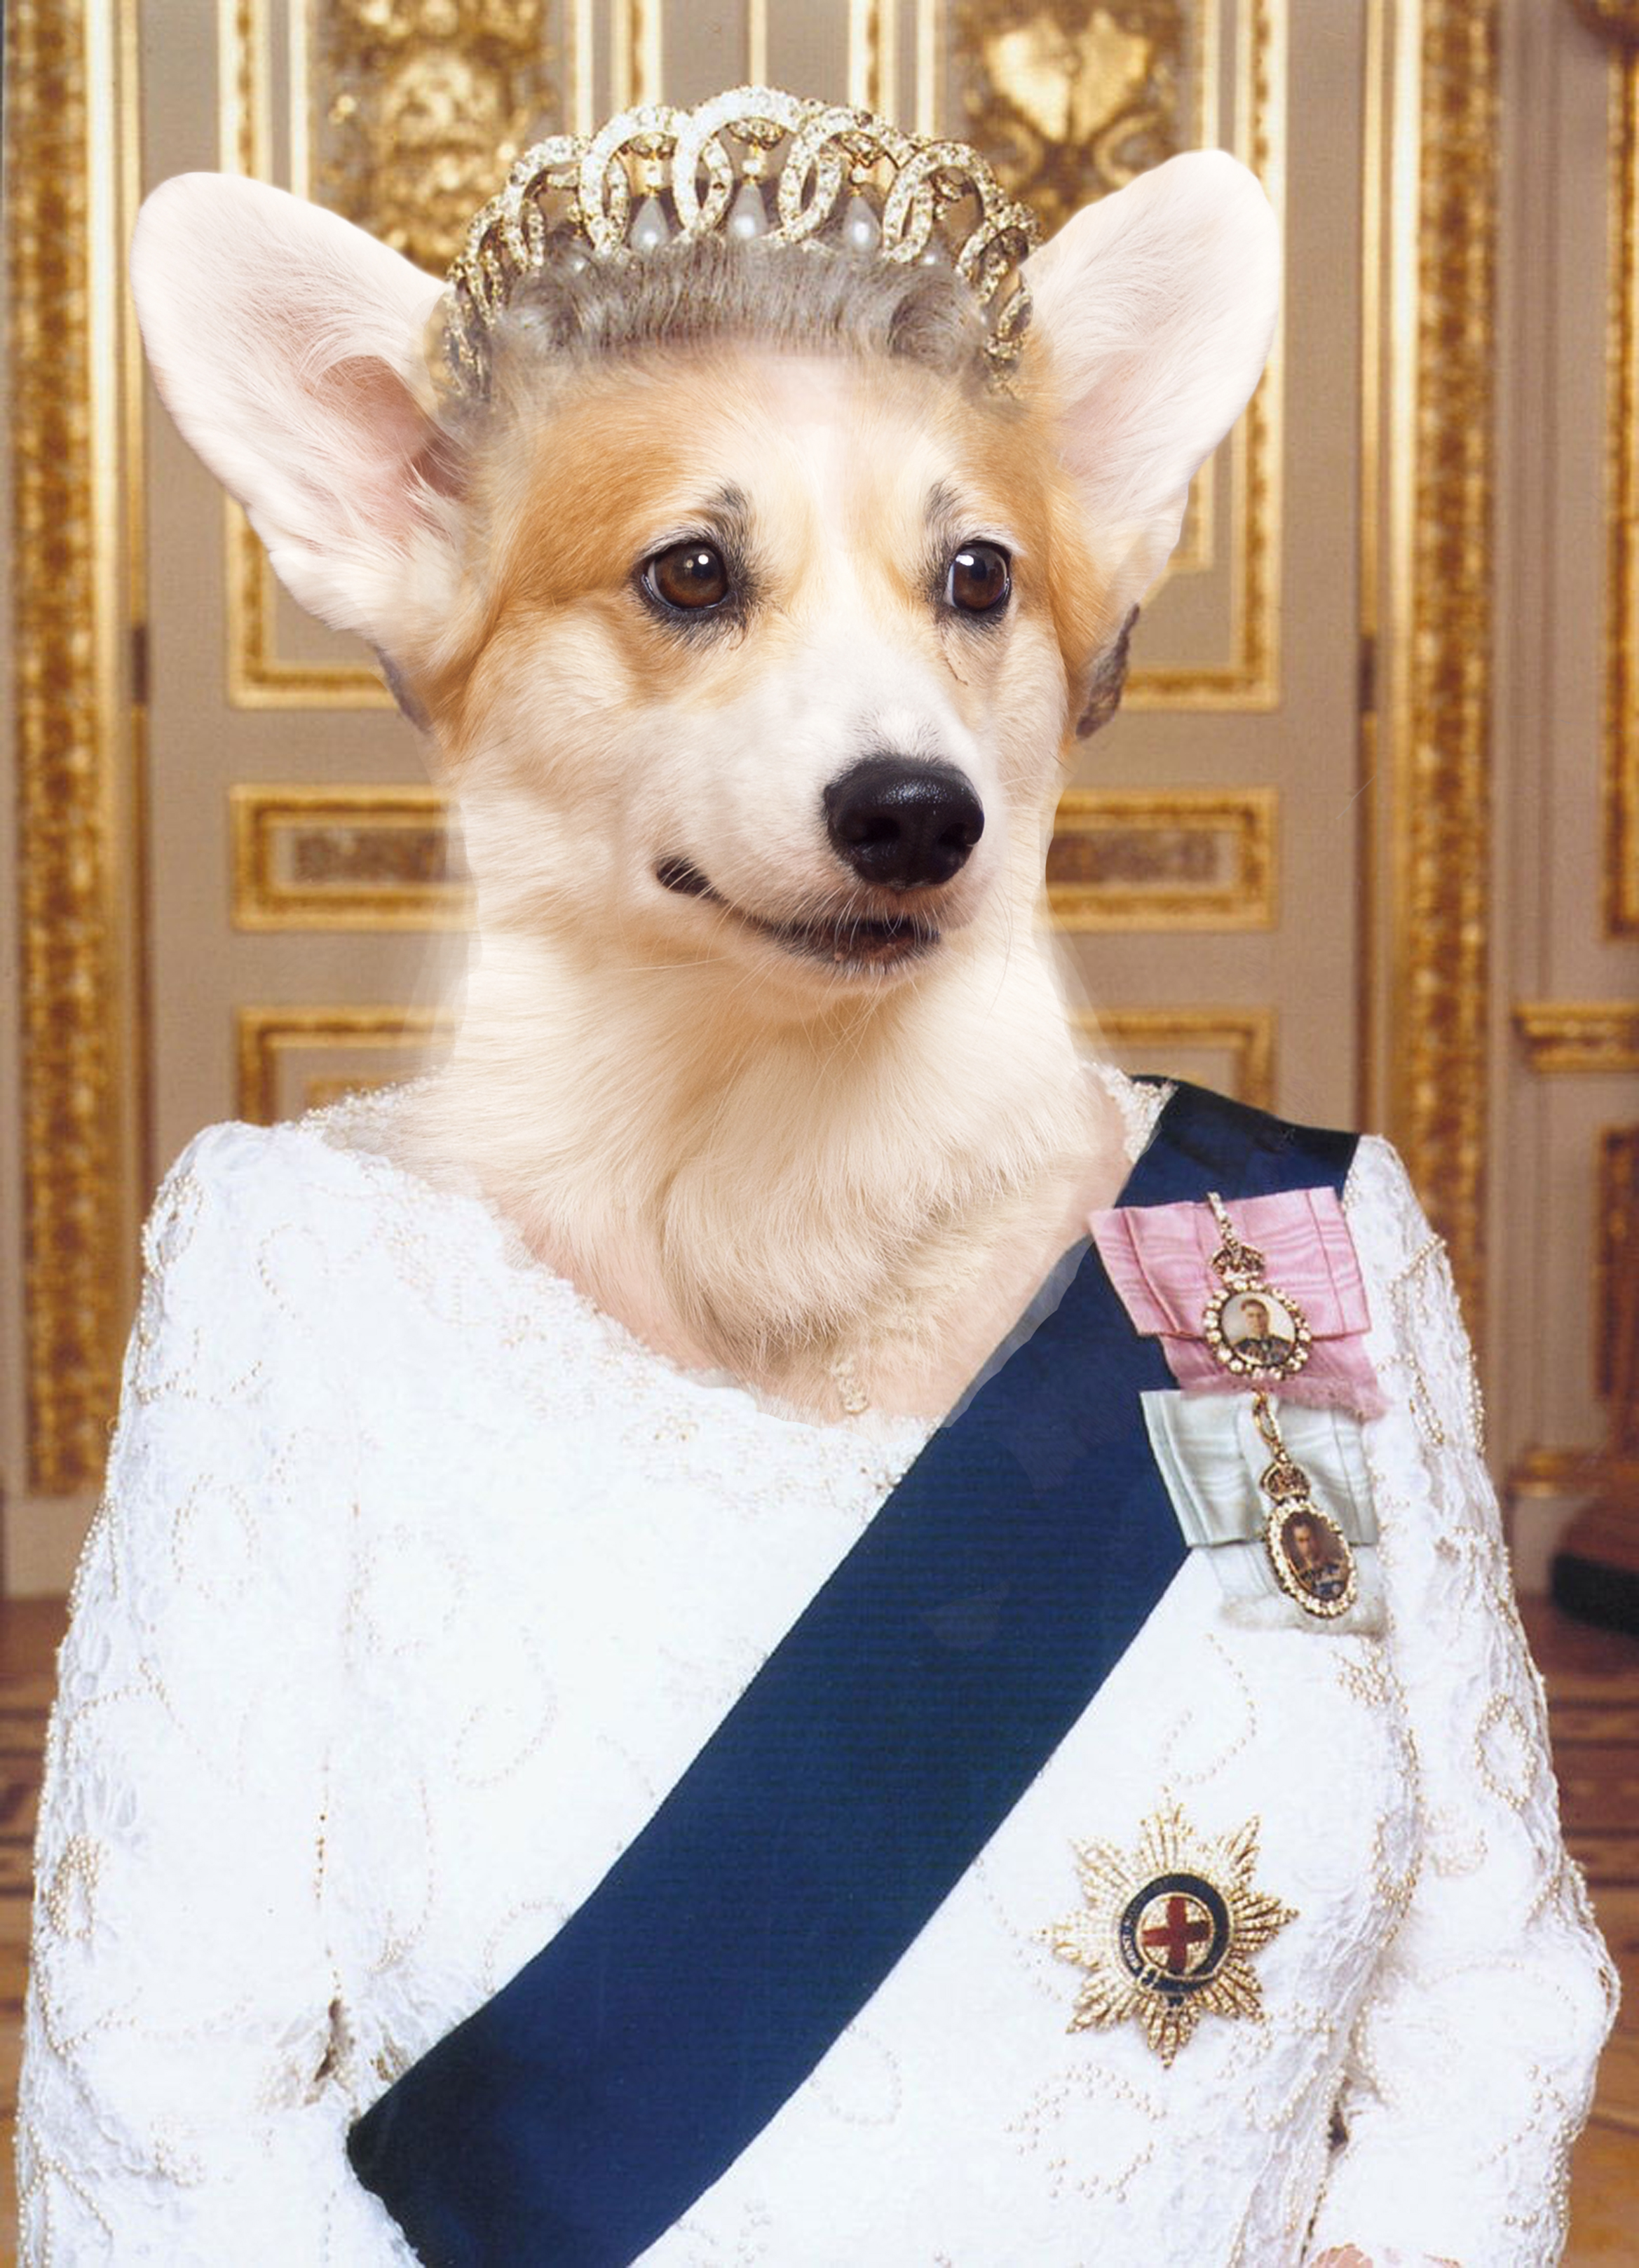 Kudzu the Corgi as Queen Elizabeth